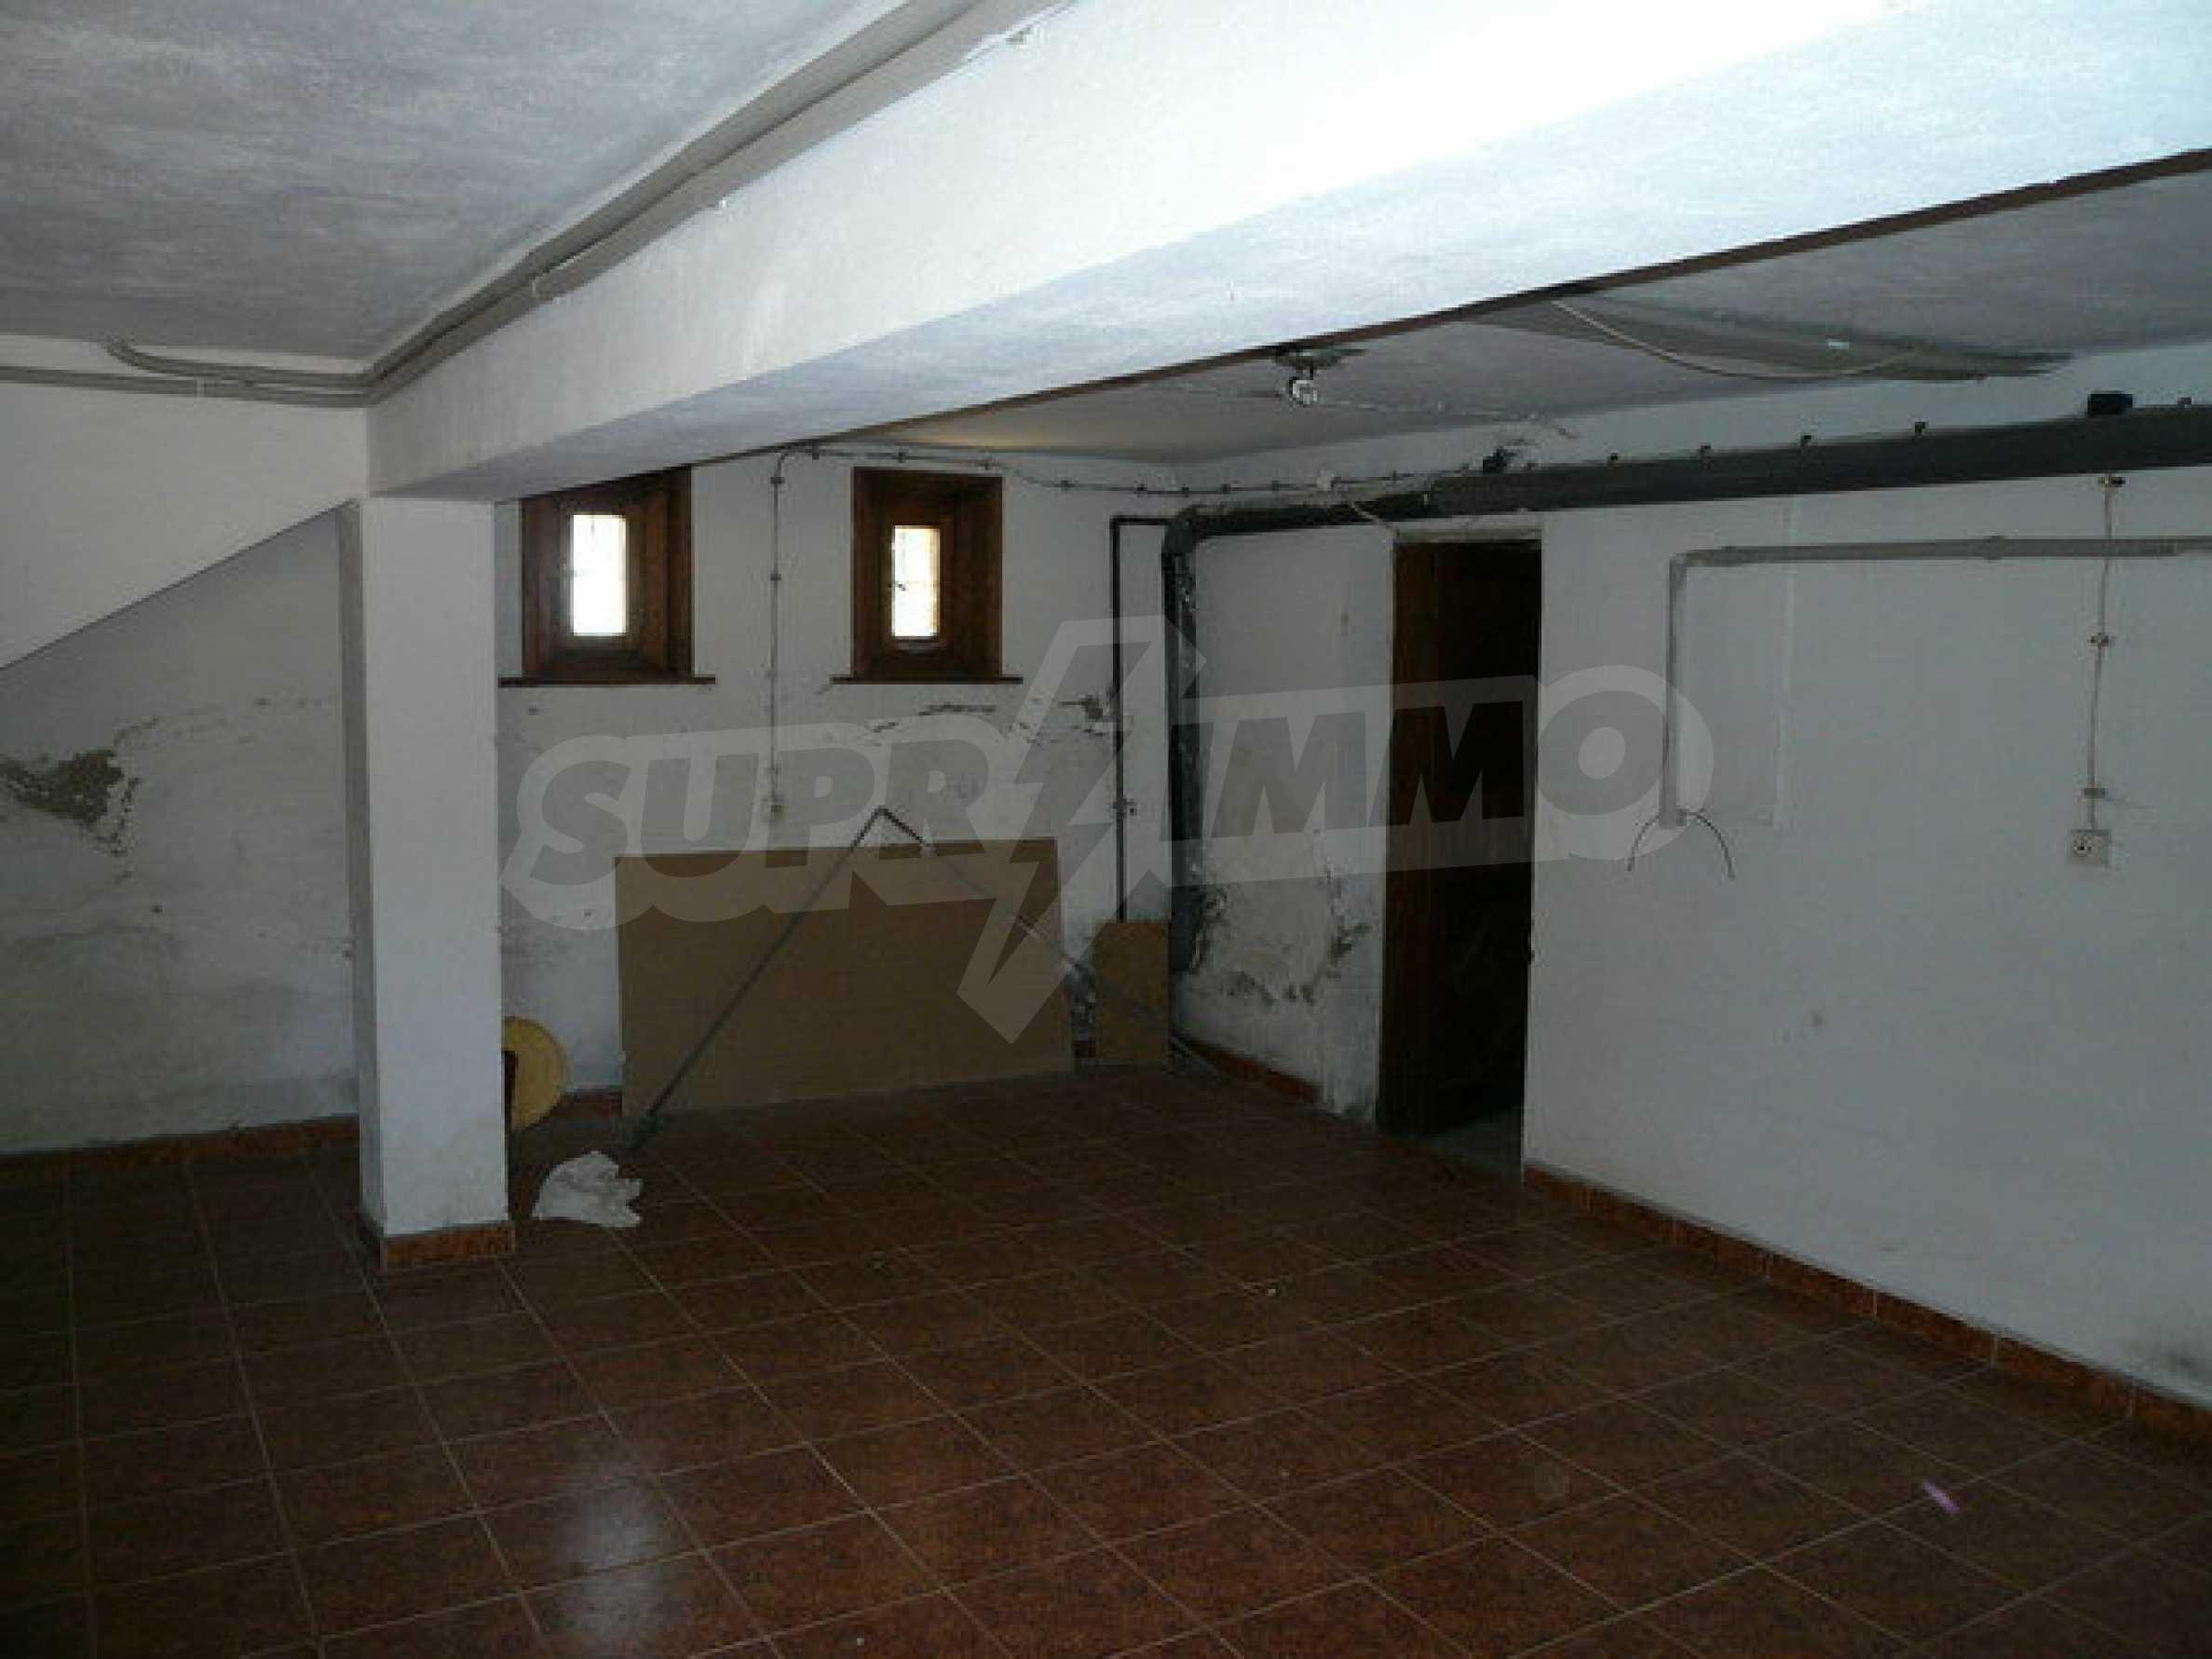 Renoviertes Haus nur 3 km von Veliko Tarnovo entfernt 11